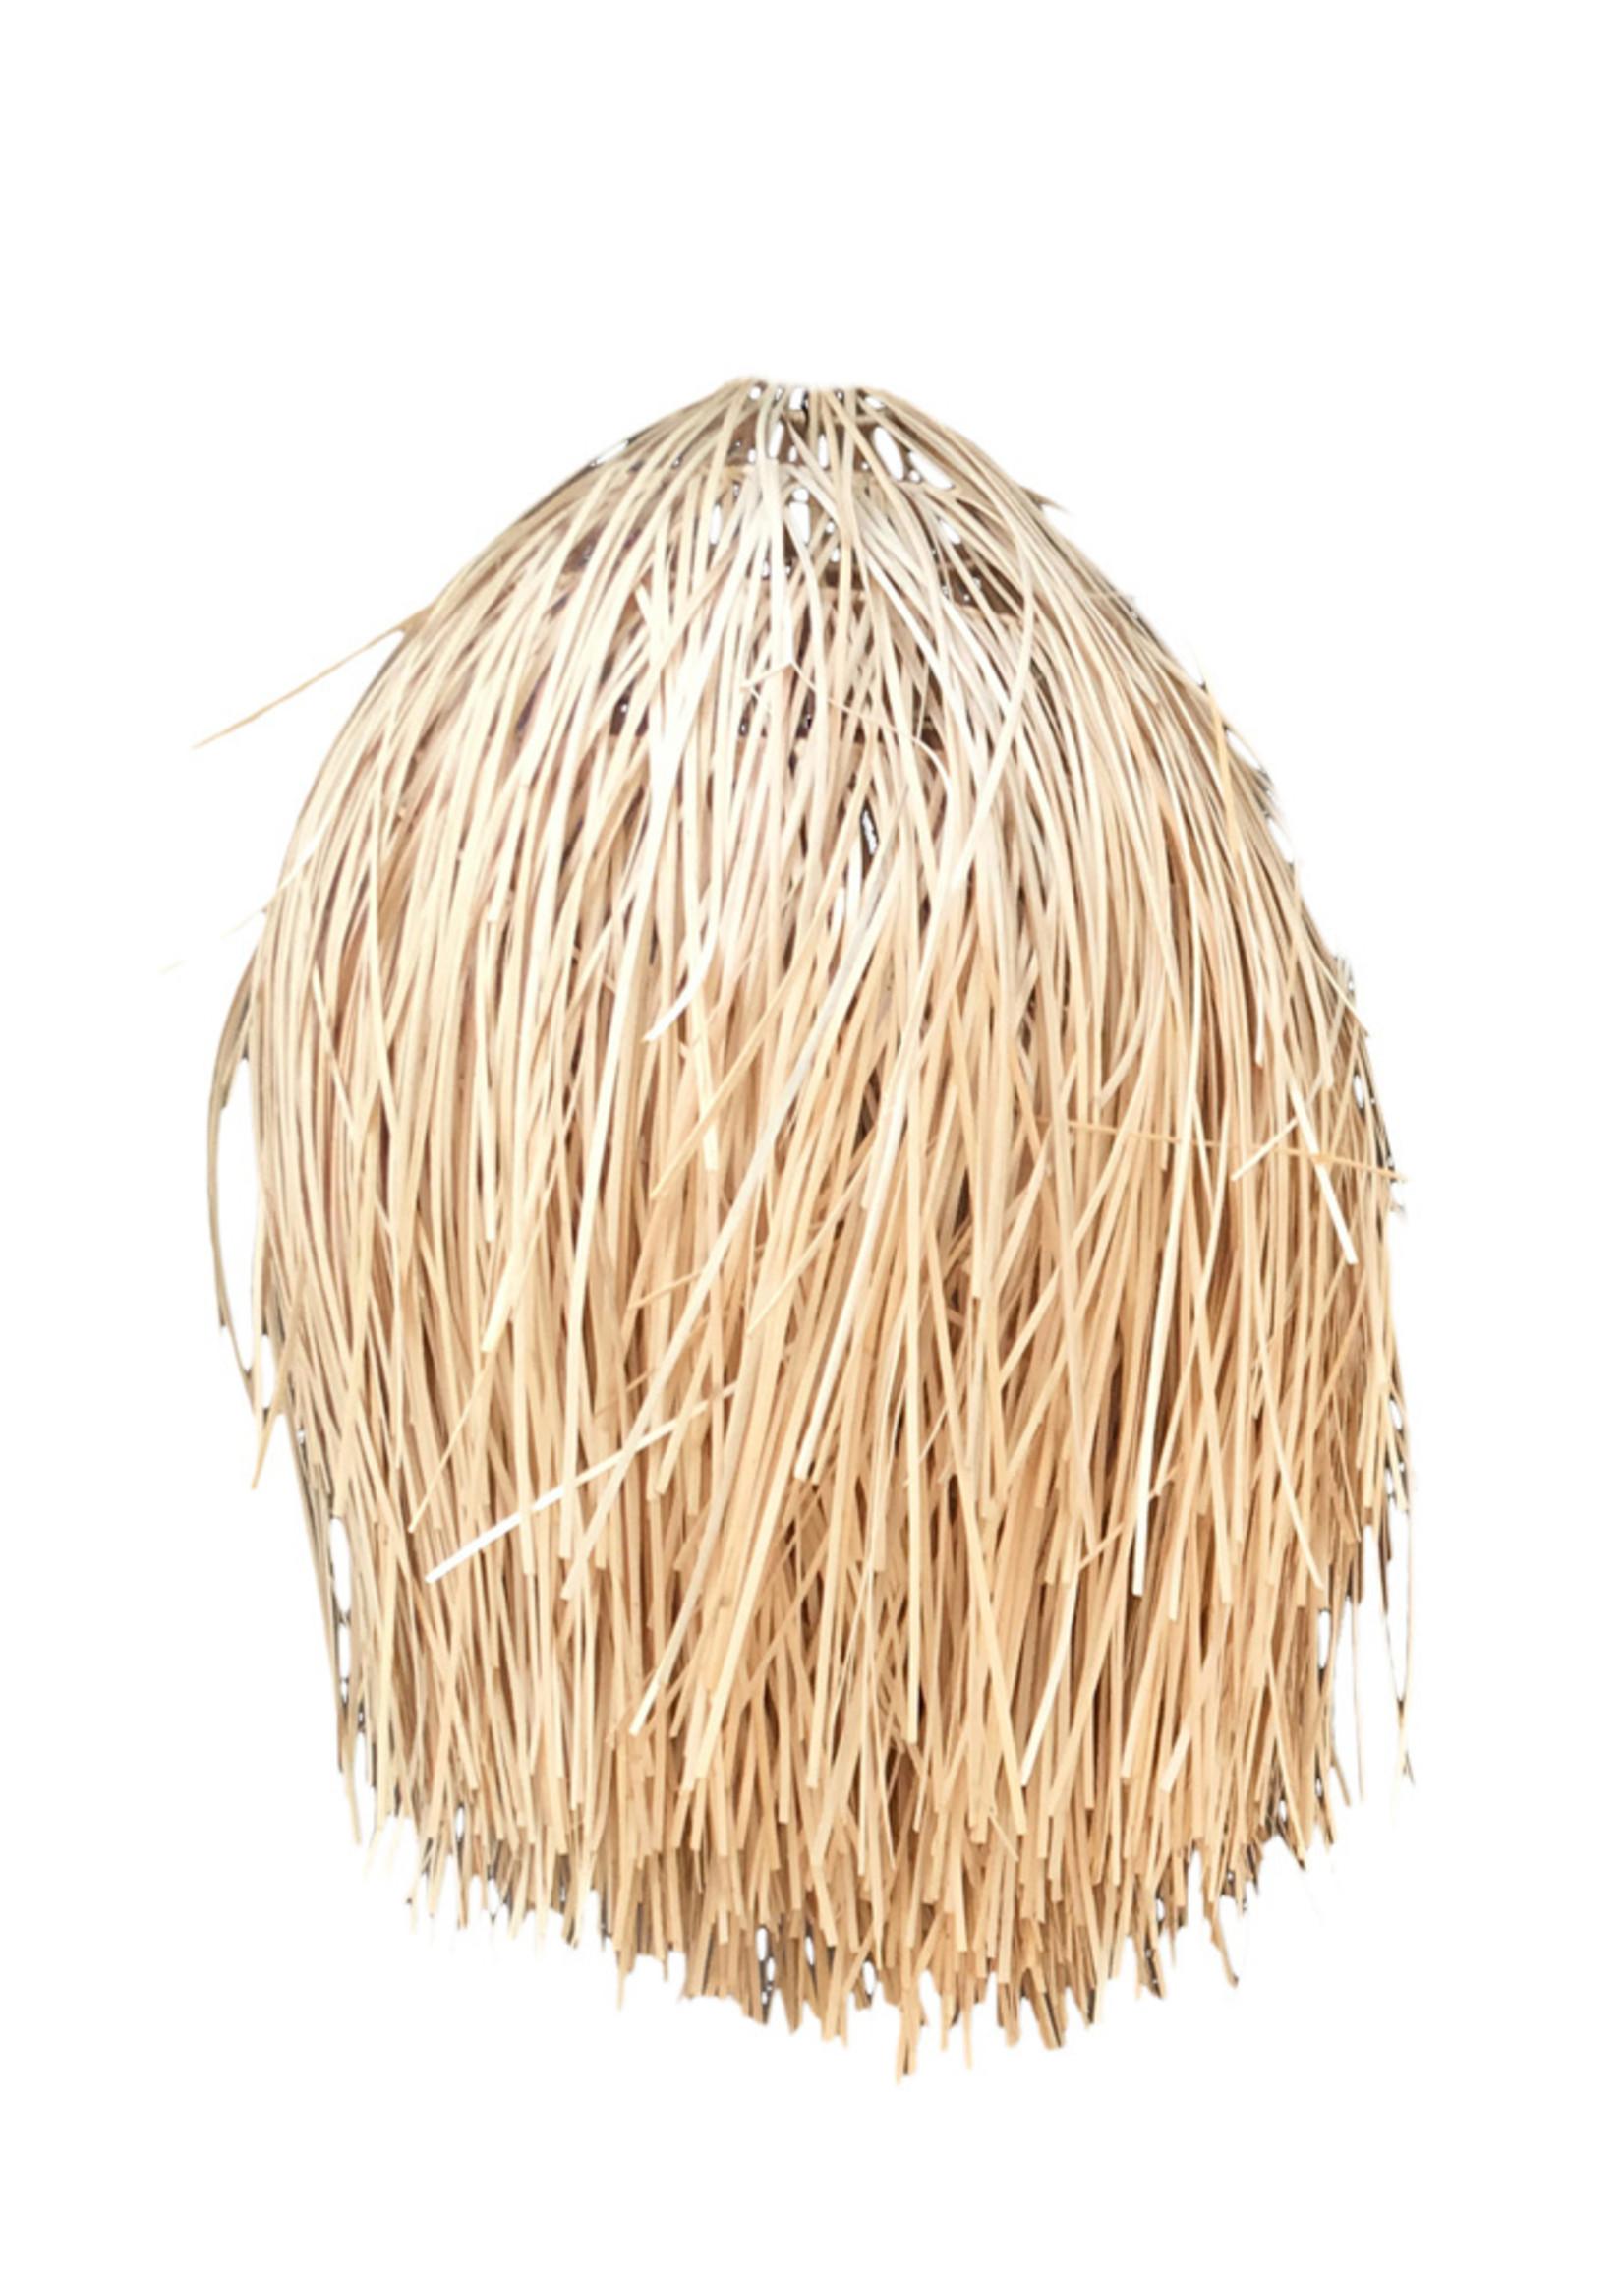 The Rattan Shaggy Pendant - Natural - M